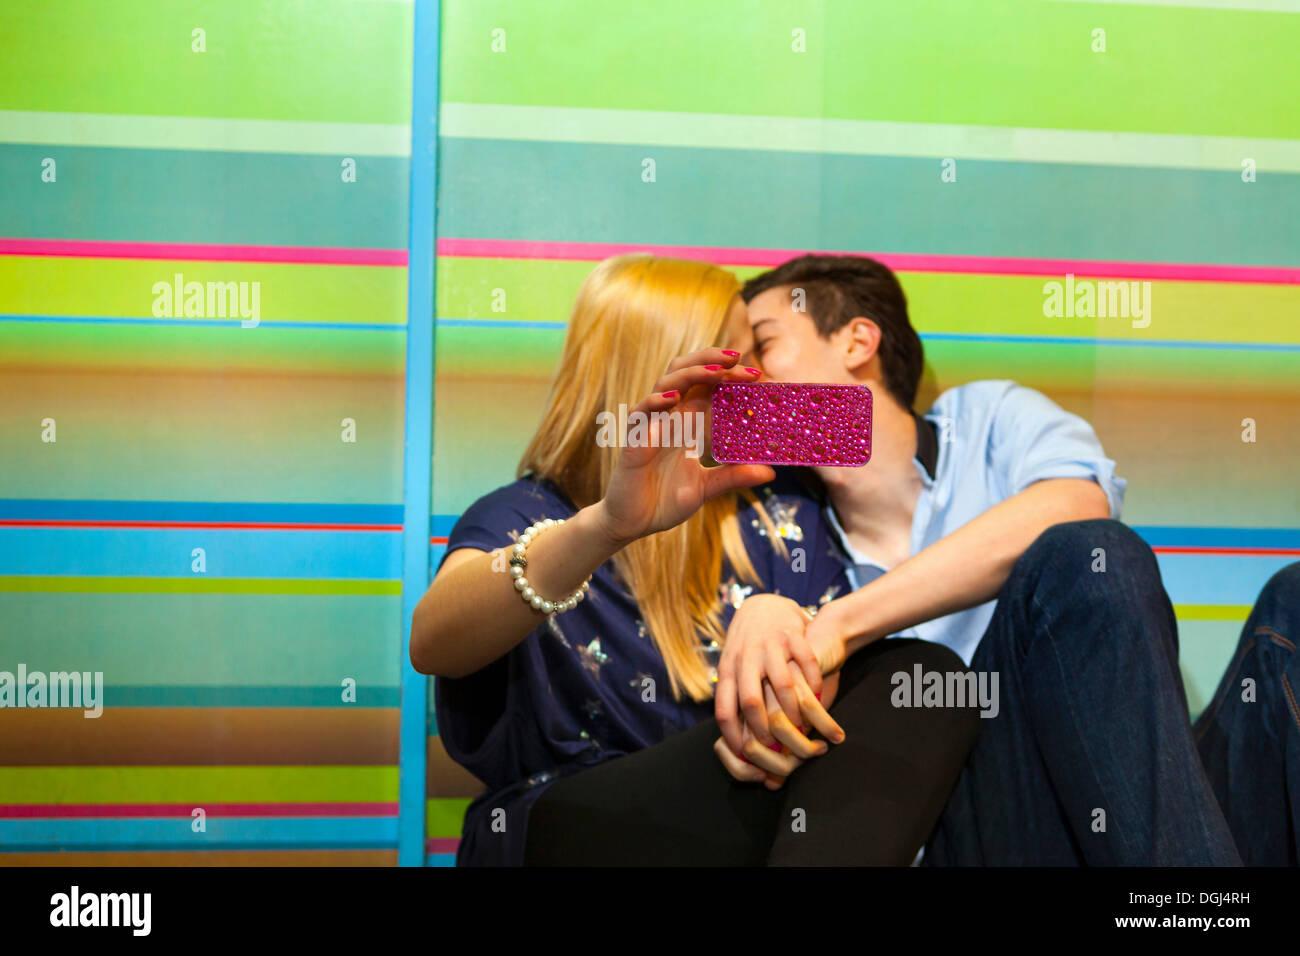 Jeune couple taking self portrait photograph of kiss Photo Stock